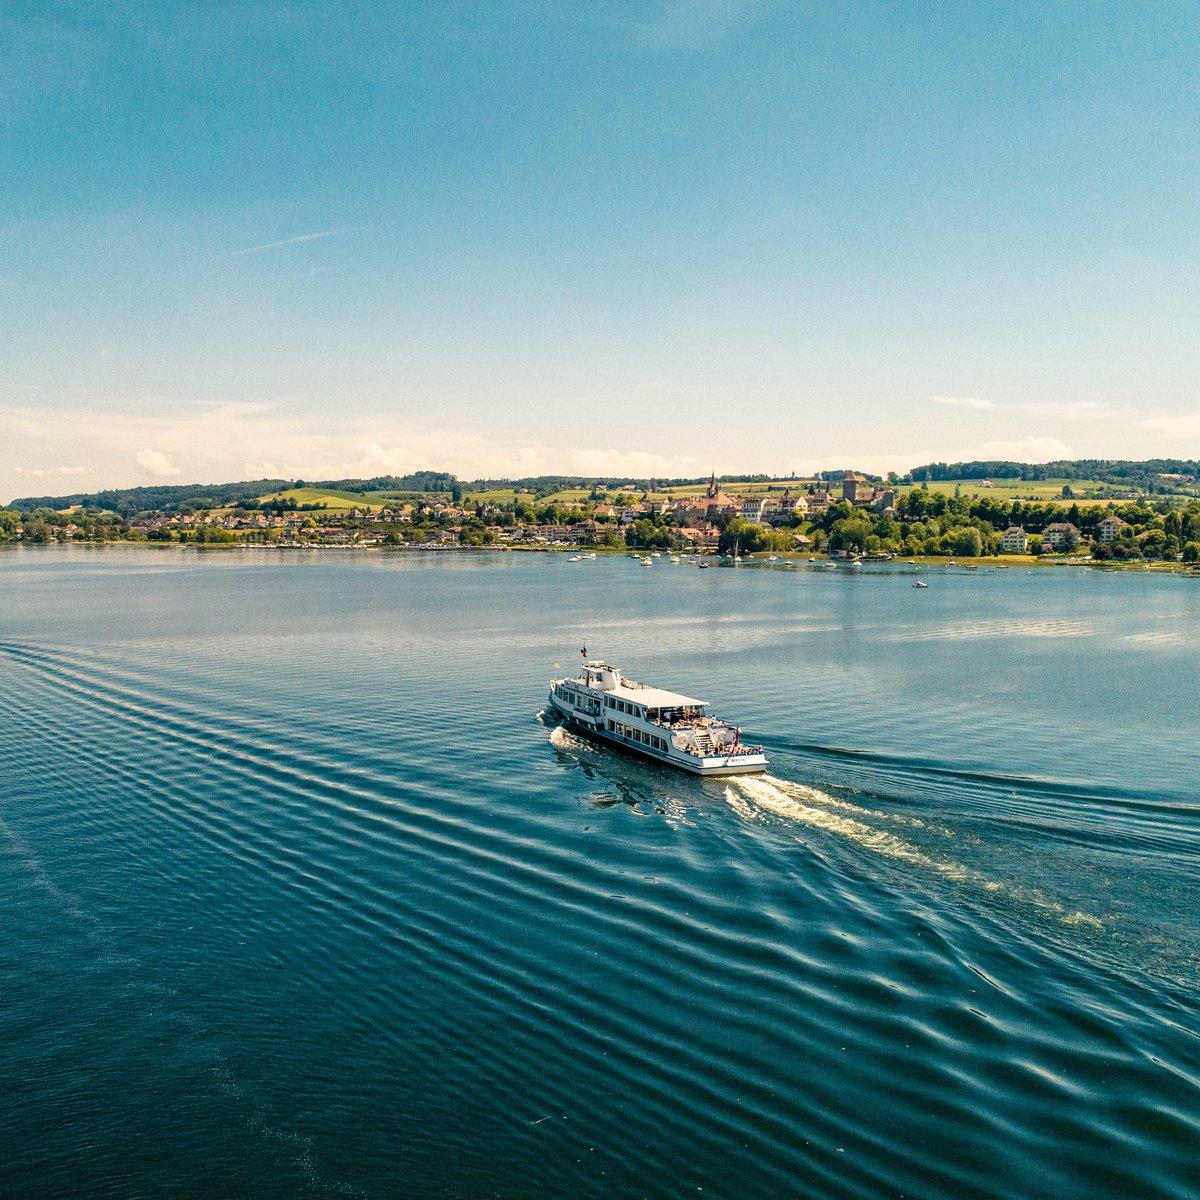 🛳️ رحلة على بحيرة مورتين في منطقة فرايبورغ https://t.co/jmJqwc6JMs https://t.co/BDwcLmz34n